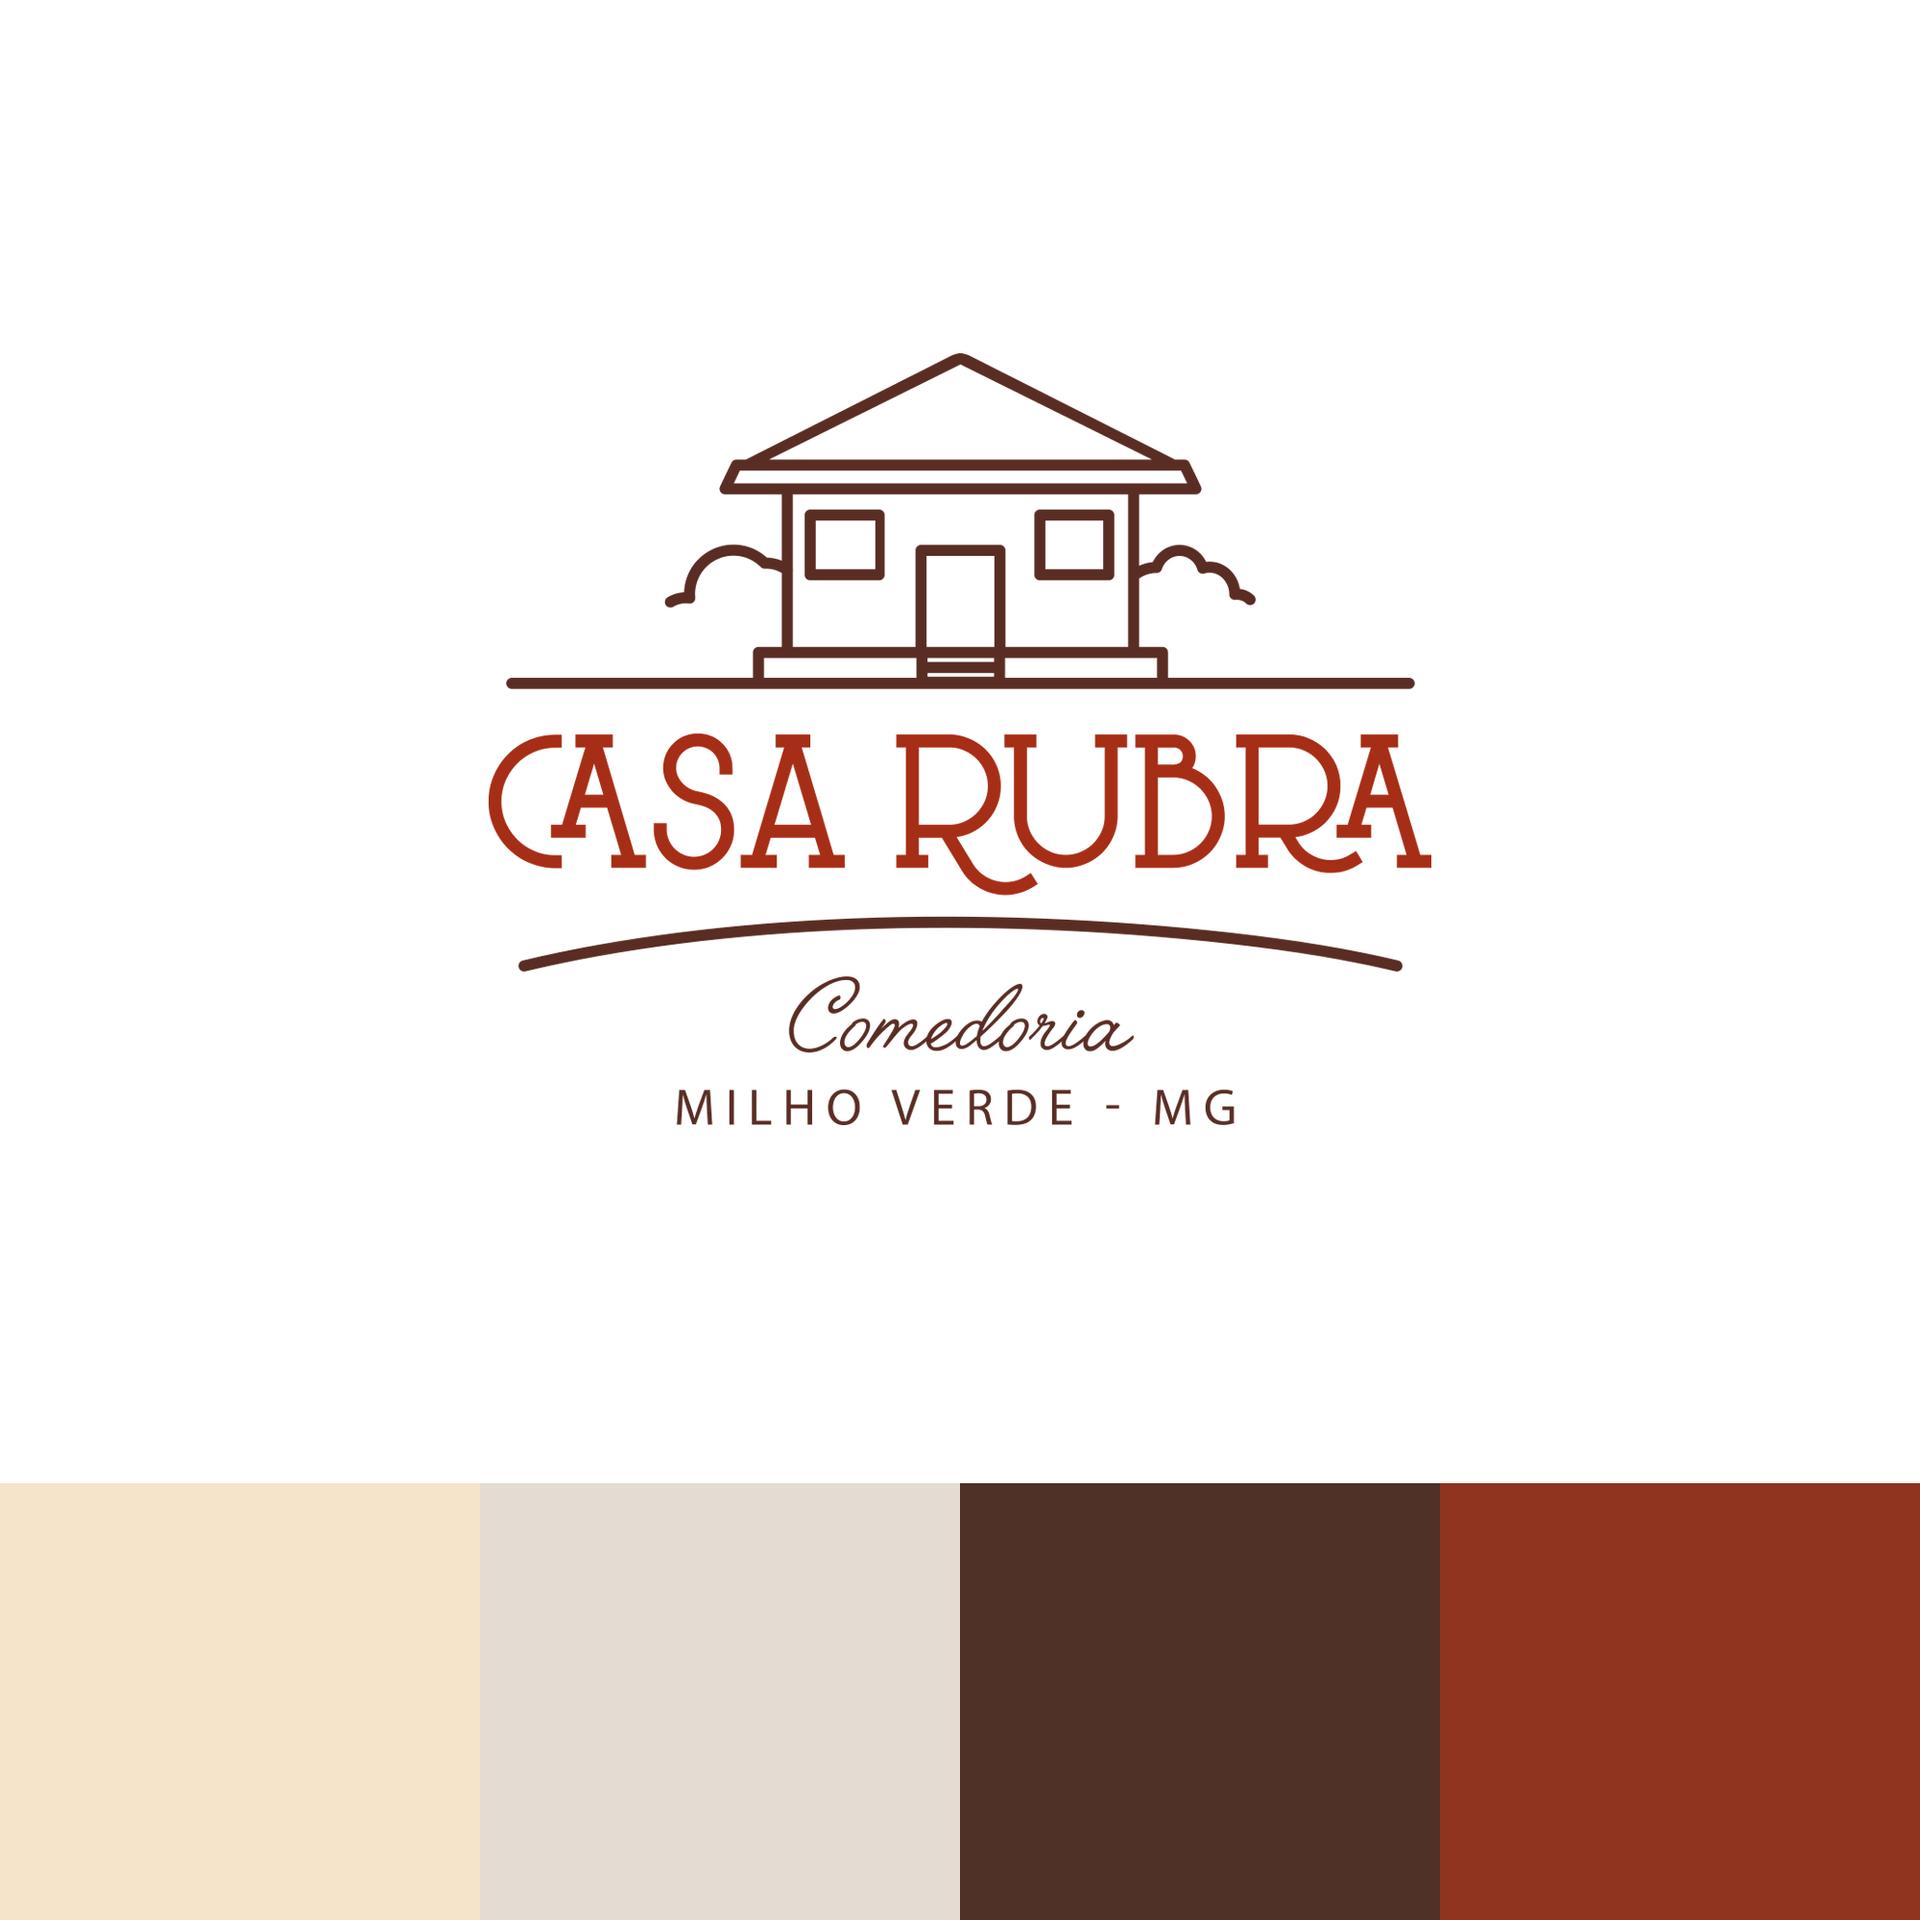 Casa_Rubra_Portfolio_27.png